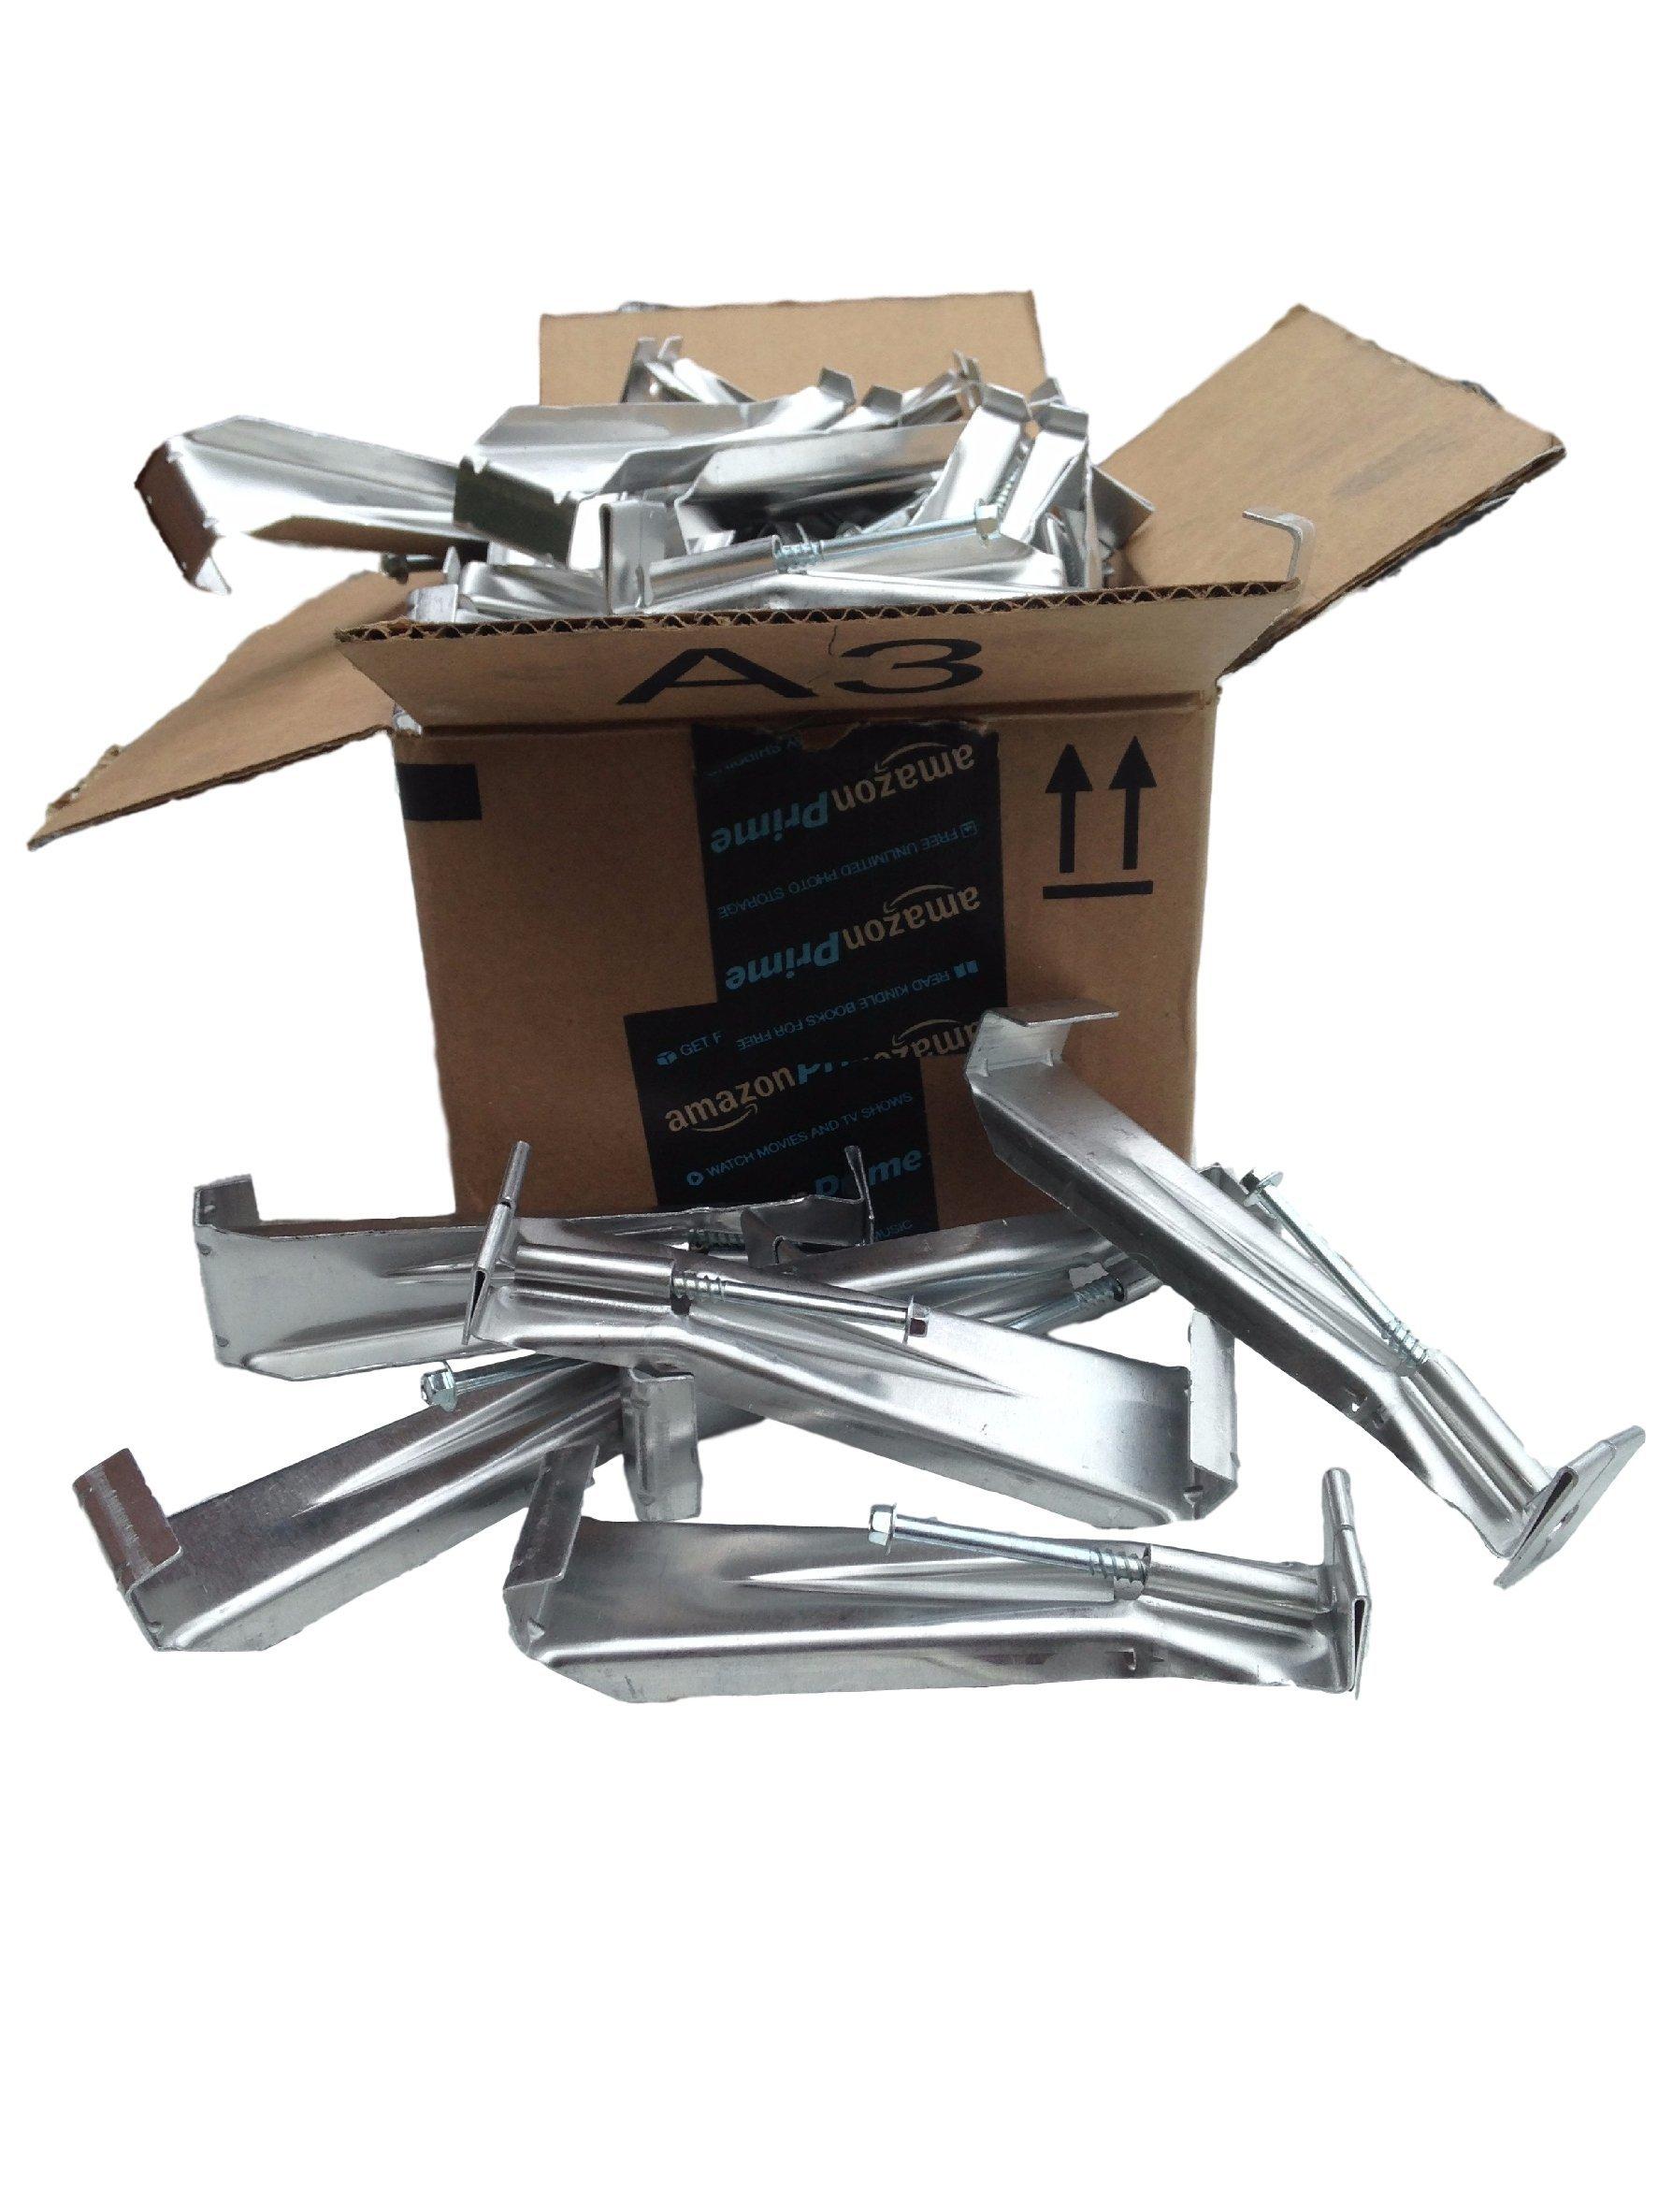 6 inch Quick Screw hidden gutter hanger (50 pack)